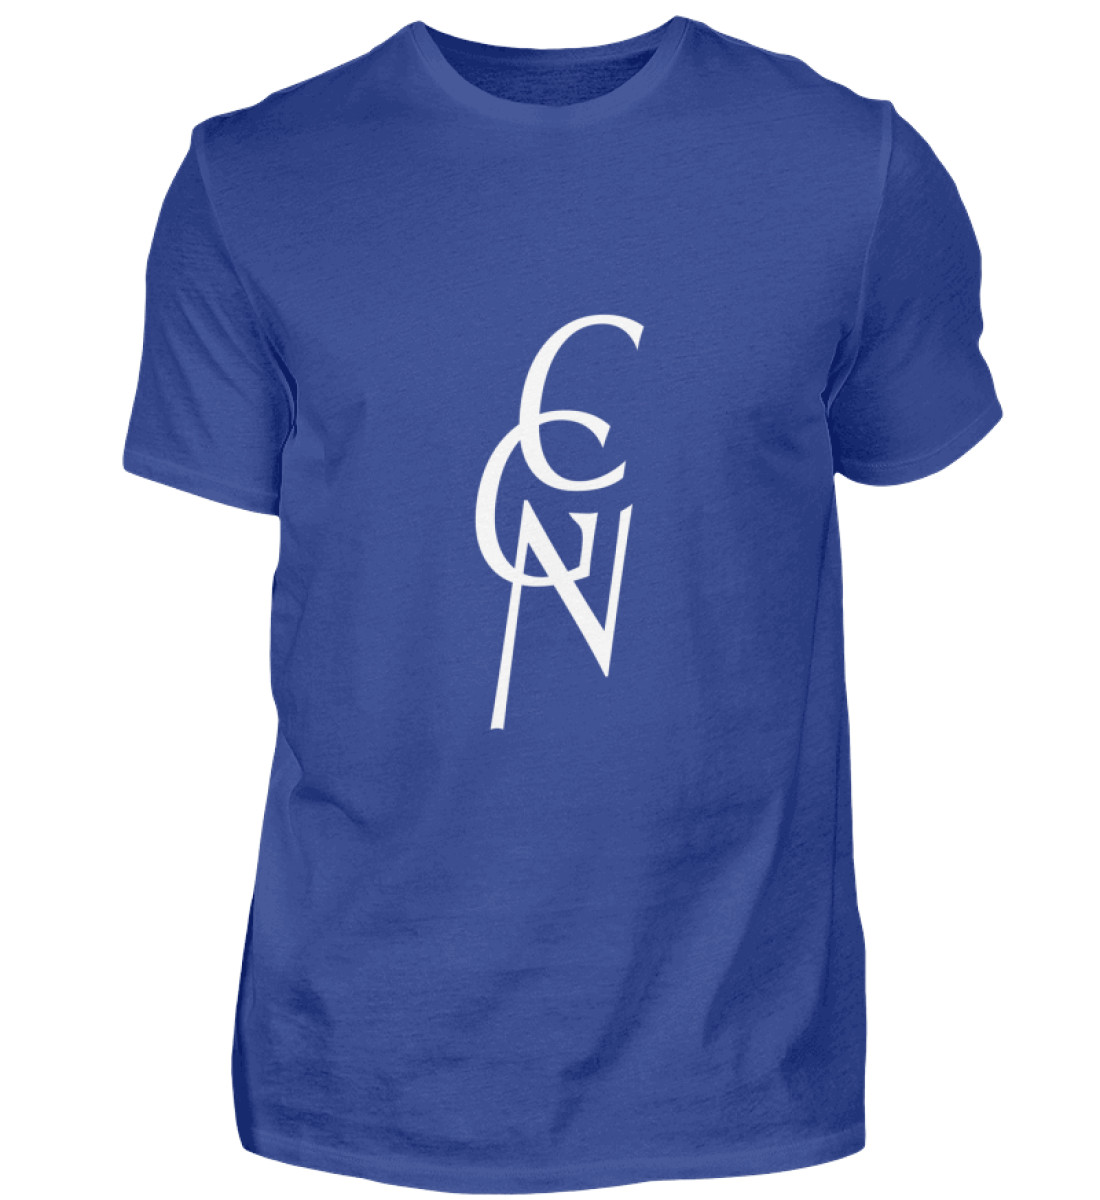 CGN - T-Shirt Herren - Herren Shirt-668